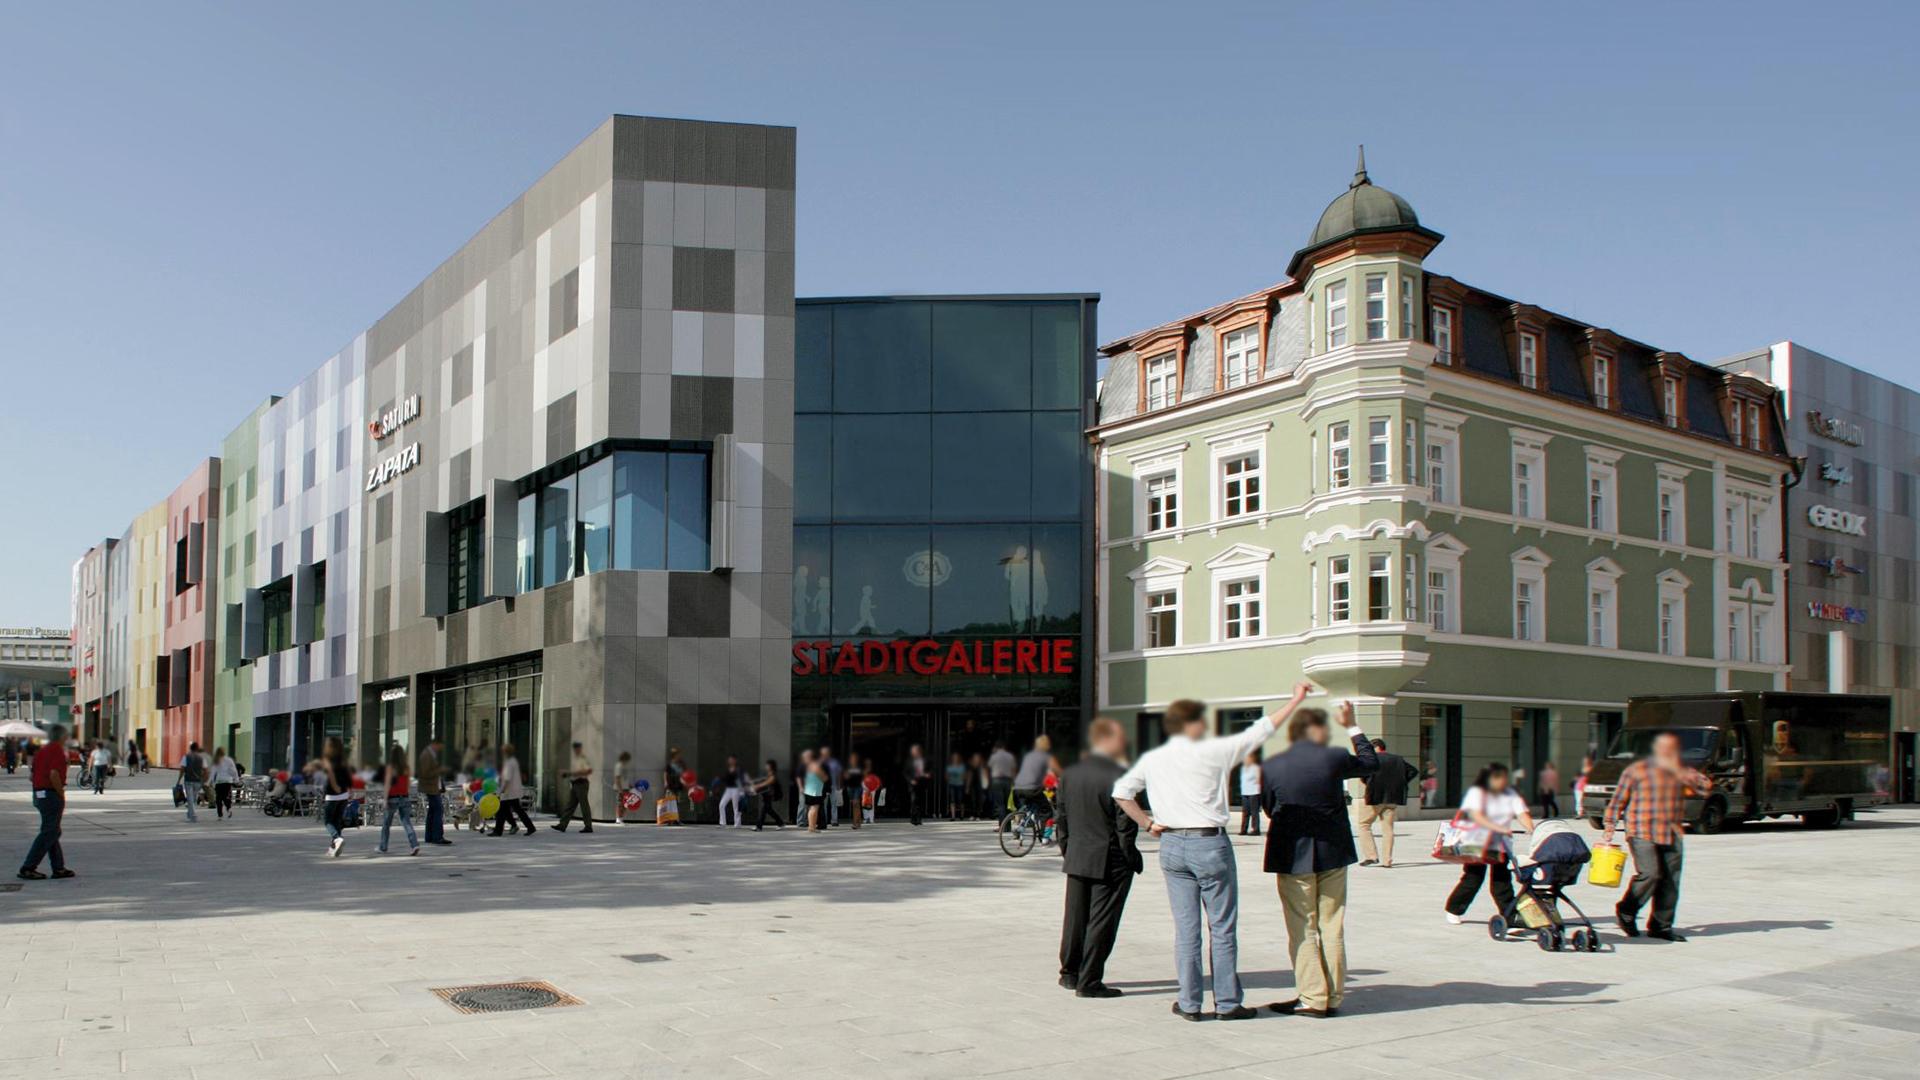 Stadtgalerie Passau